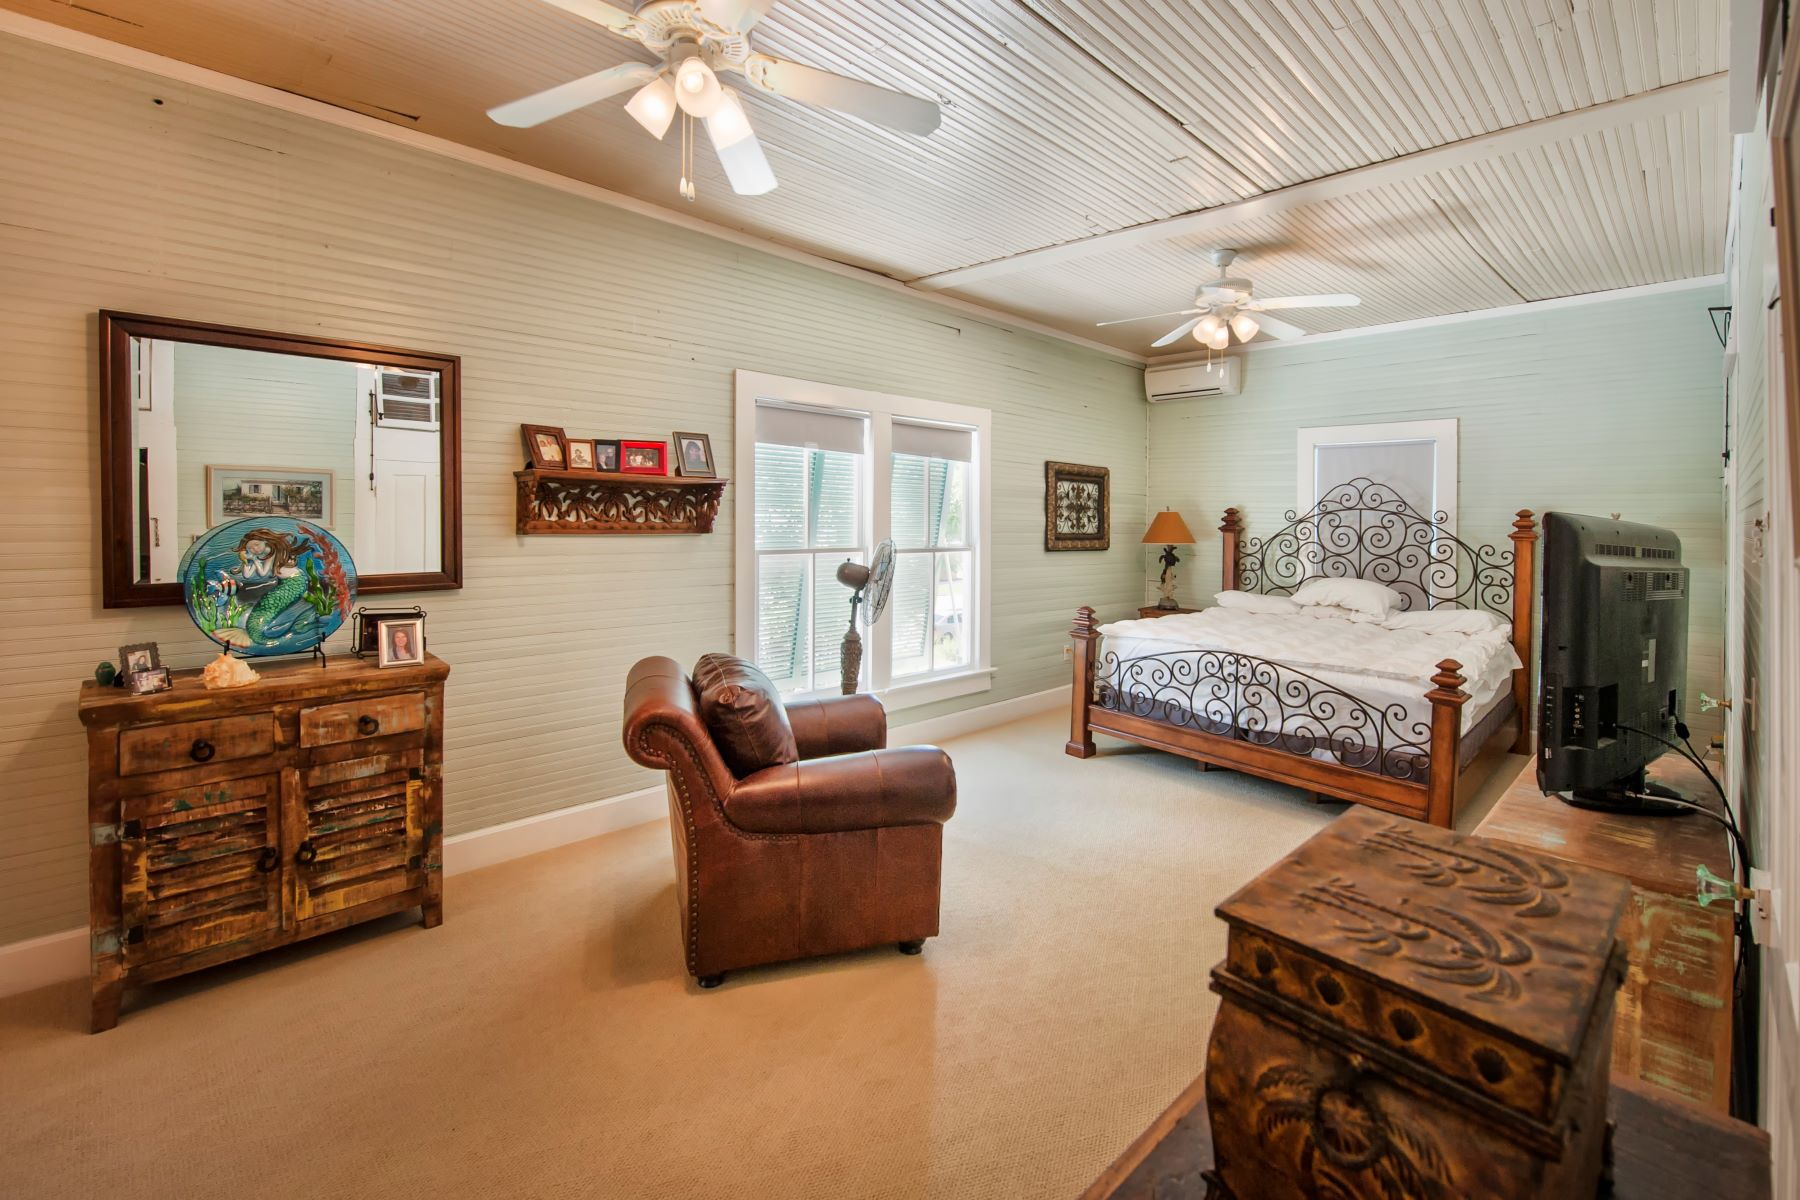 Additional photo for property listing at The Fellsmere Inn 107 N Broadway Street Fellsmere, Florida 32948 Amerika Birleşik Devletleri